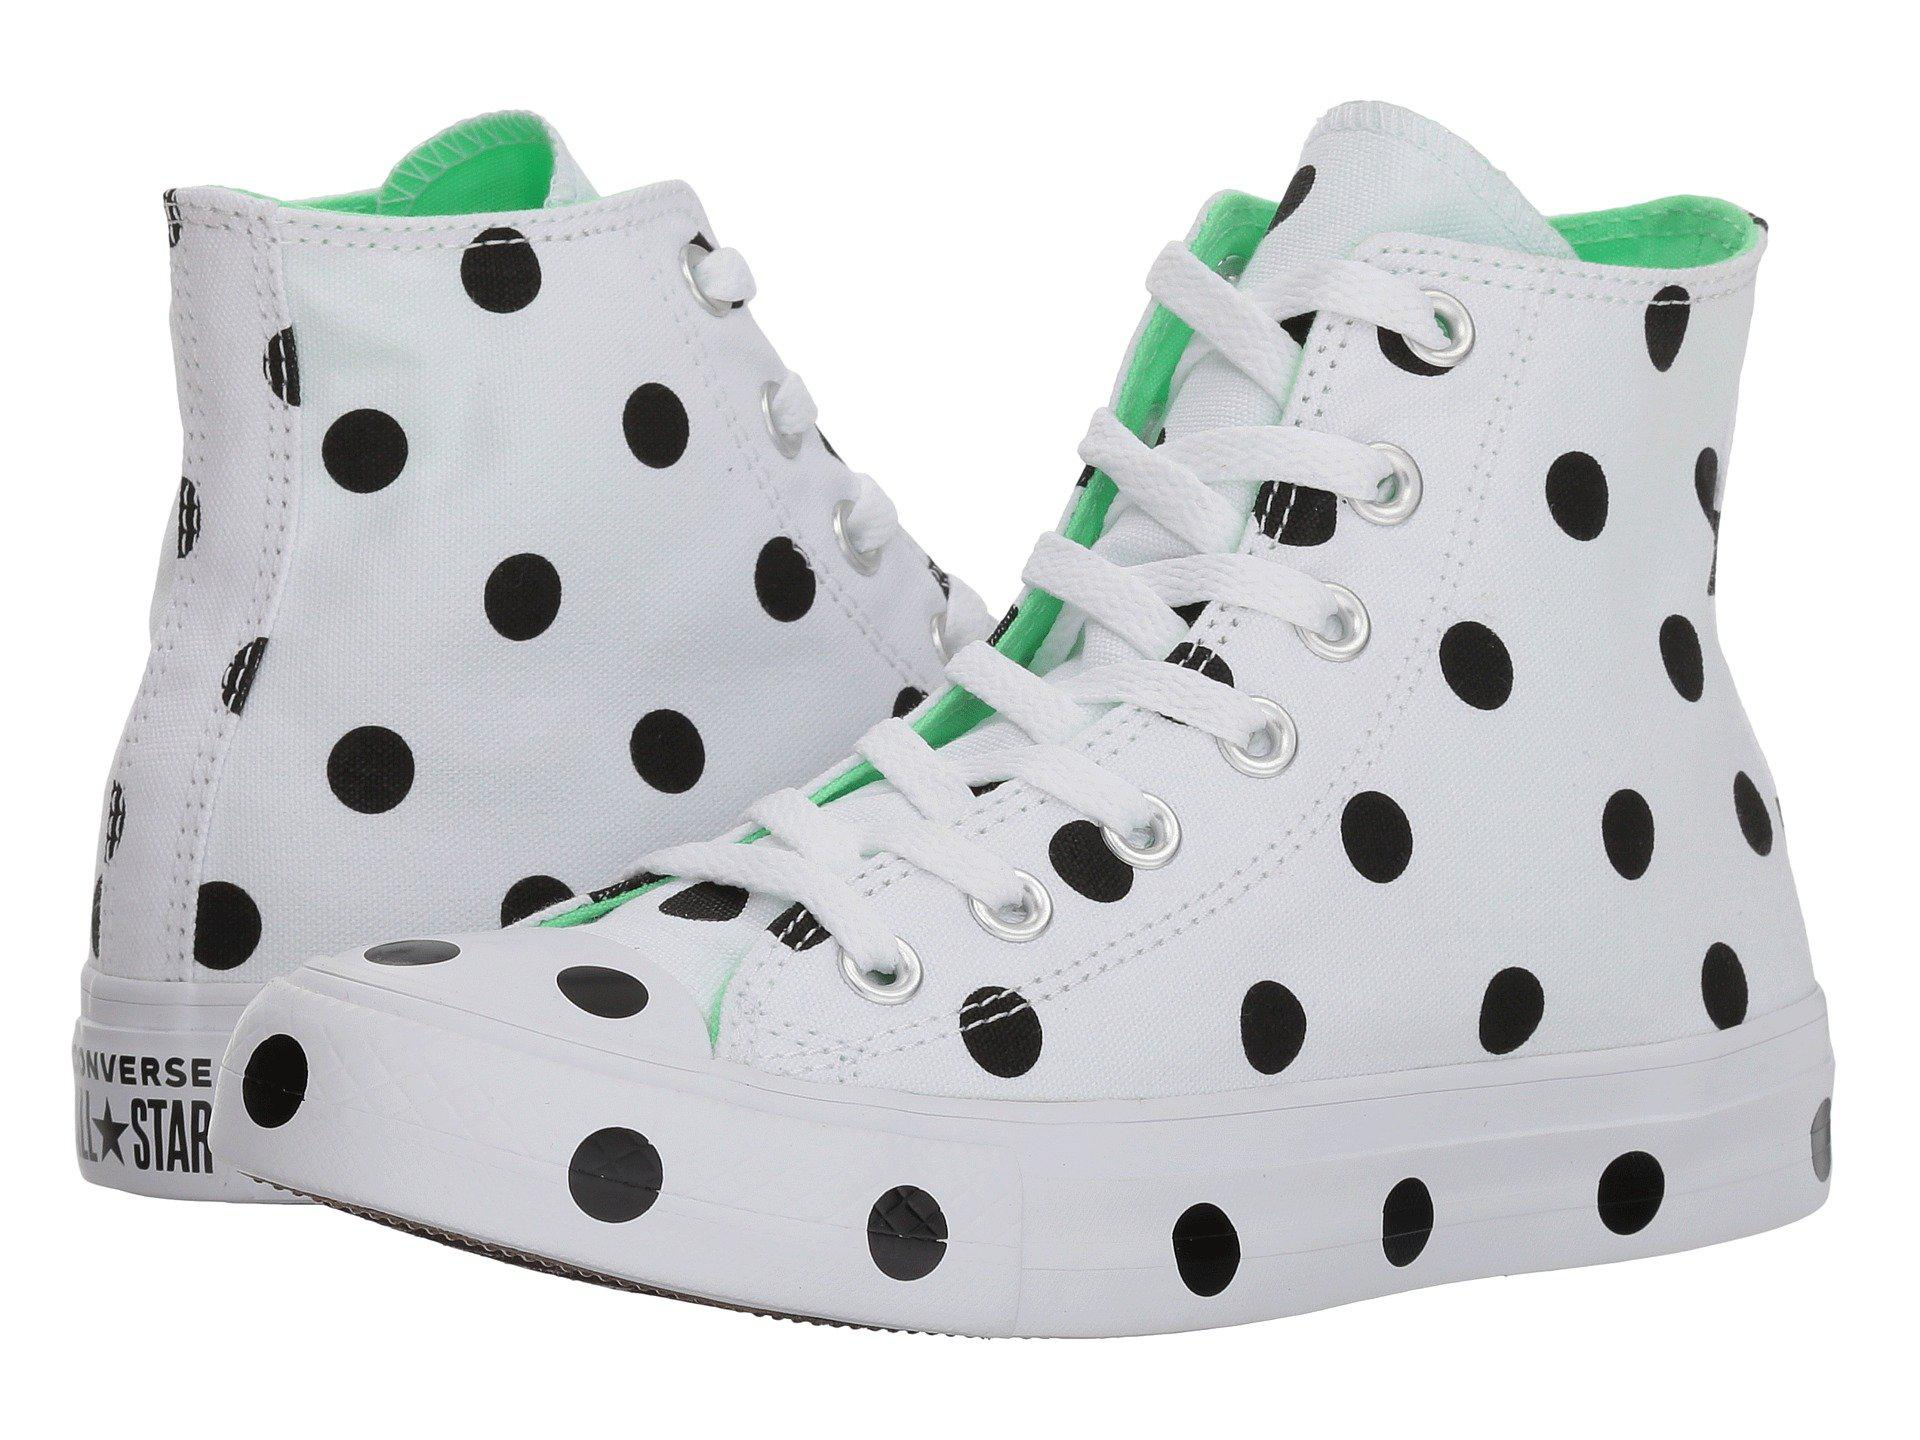 f6a6738f8a18a Converse Ctas Hi White/black/illusion Green Top Trainers